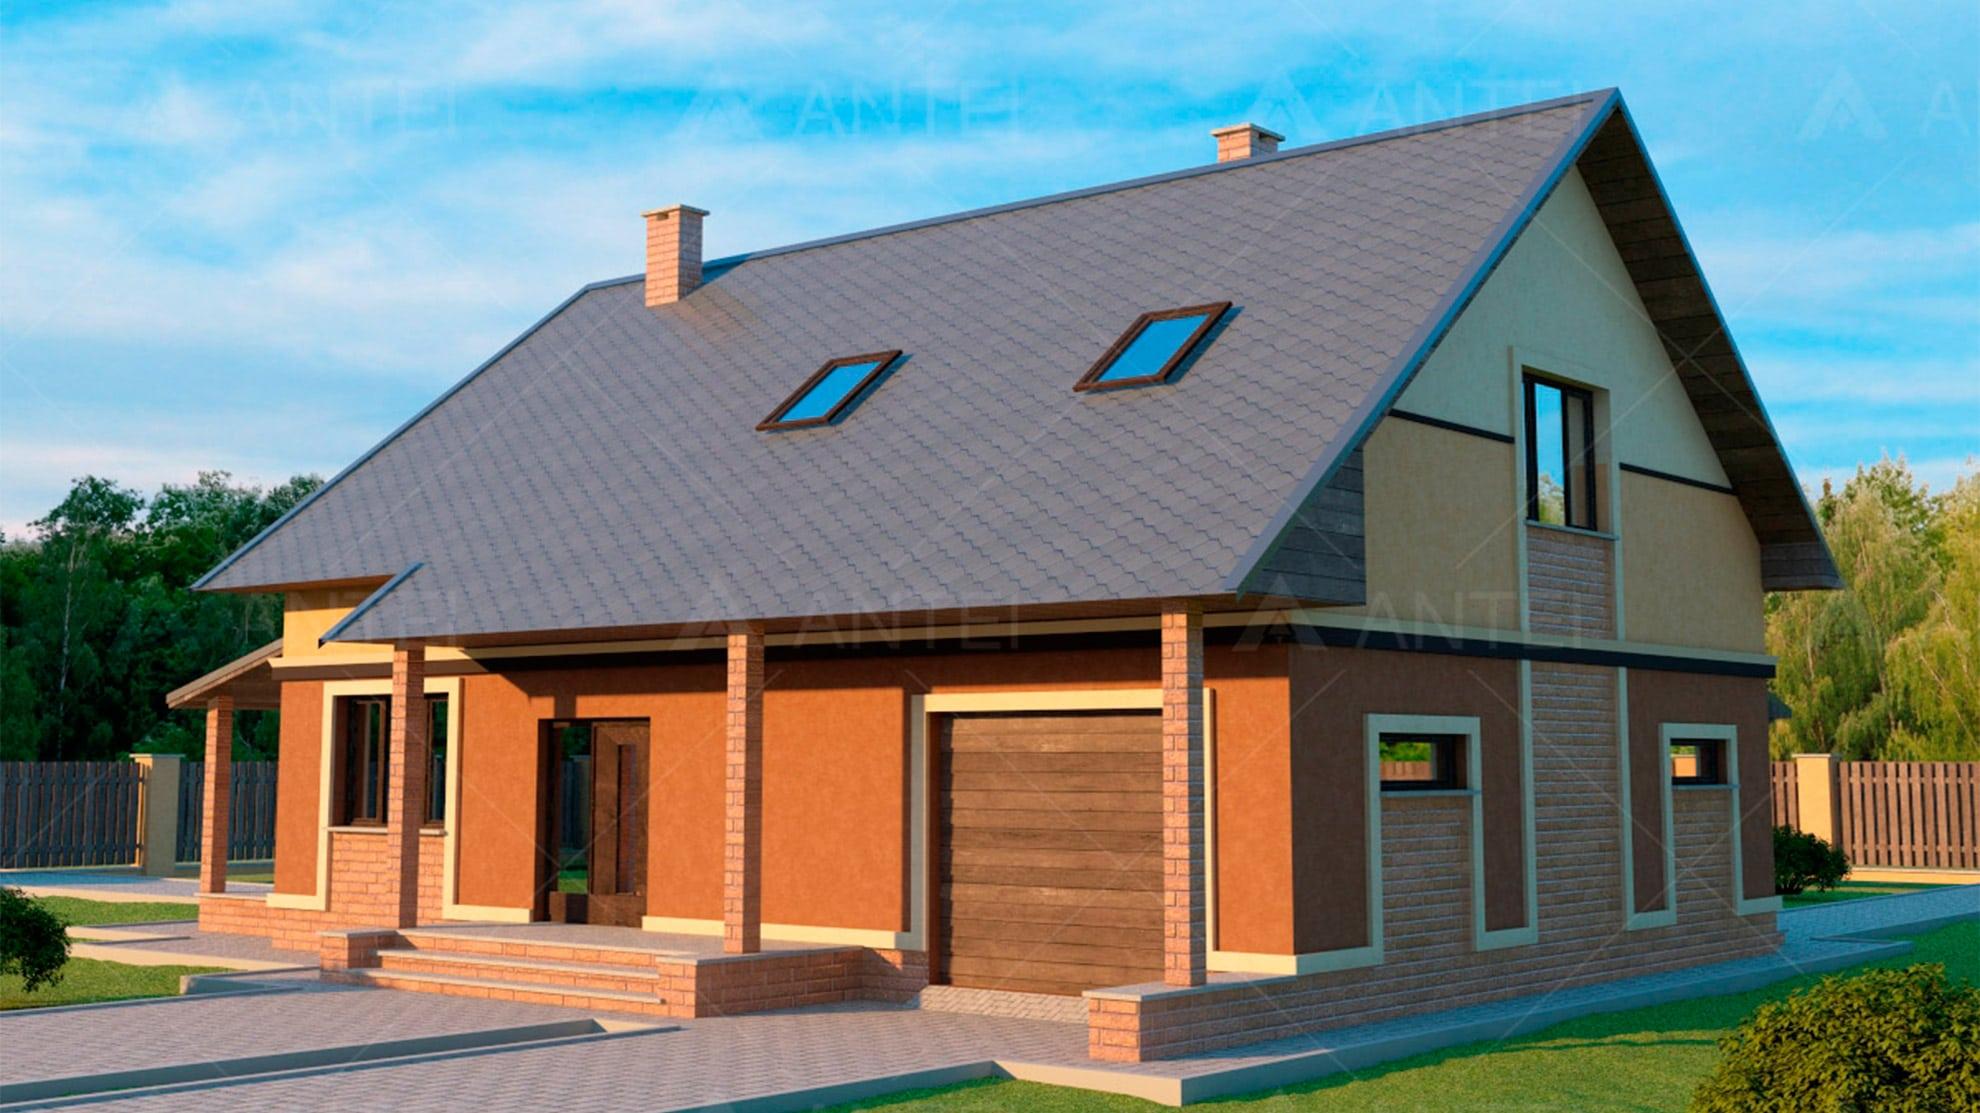 Проект мансардного дома с гаражом «КМ-18» - фото №2